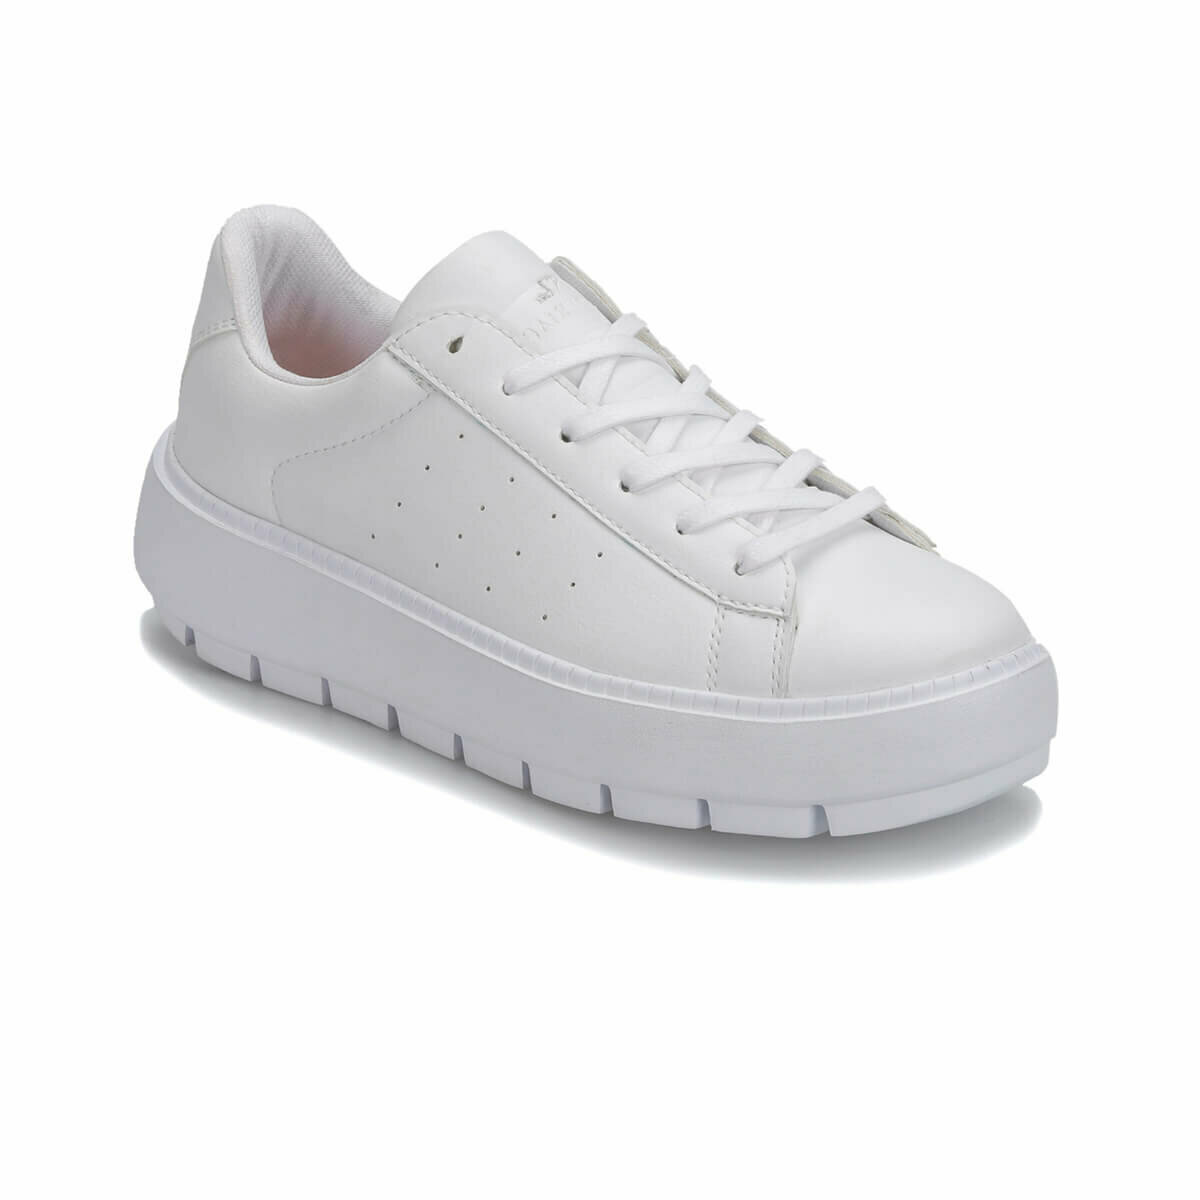 FLO KENDALL White Women 'S Sneaker Shoes LUMBERJACK